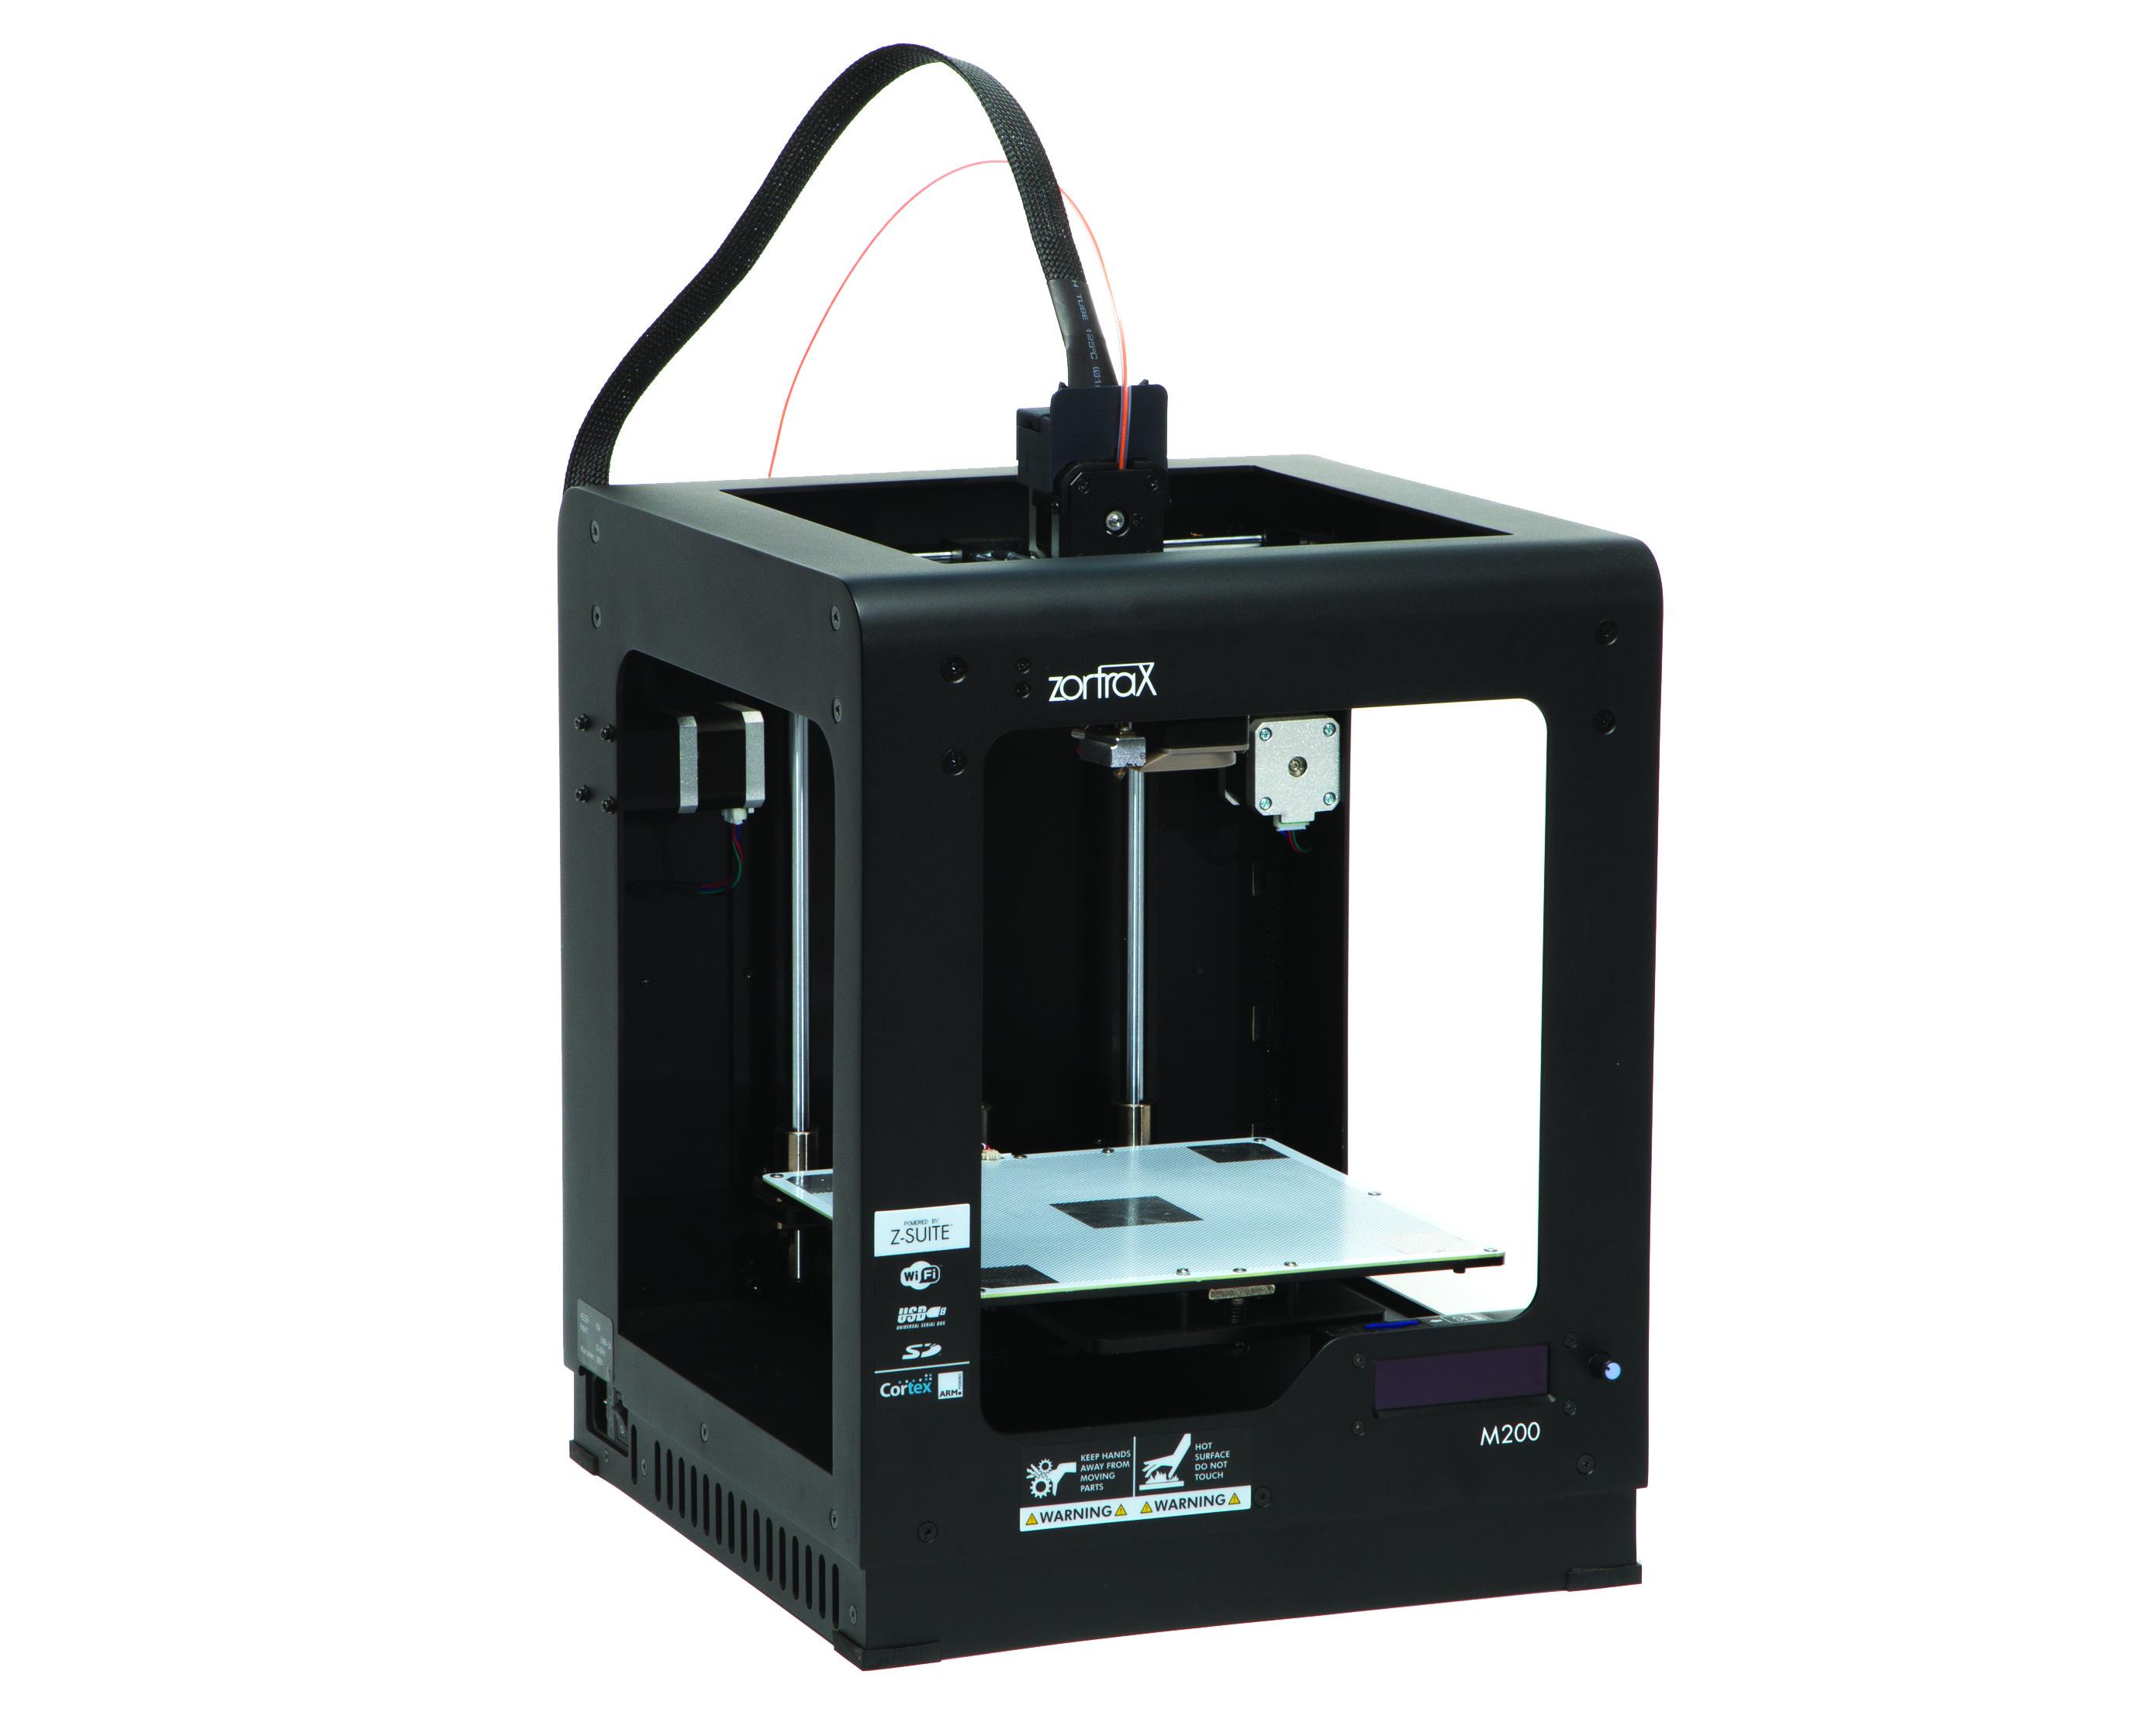 Review: Zortrax M200 3D Printer